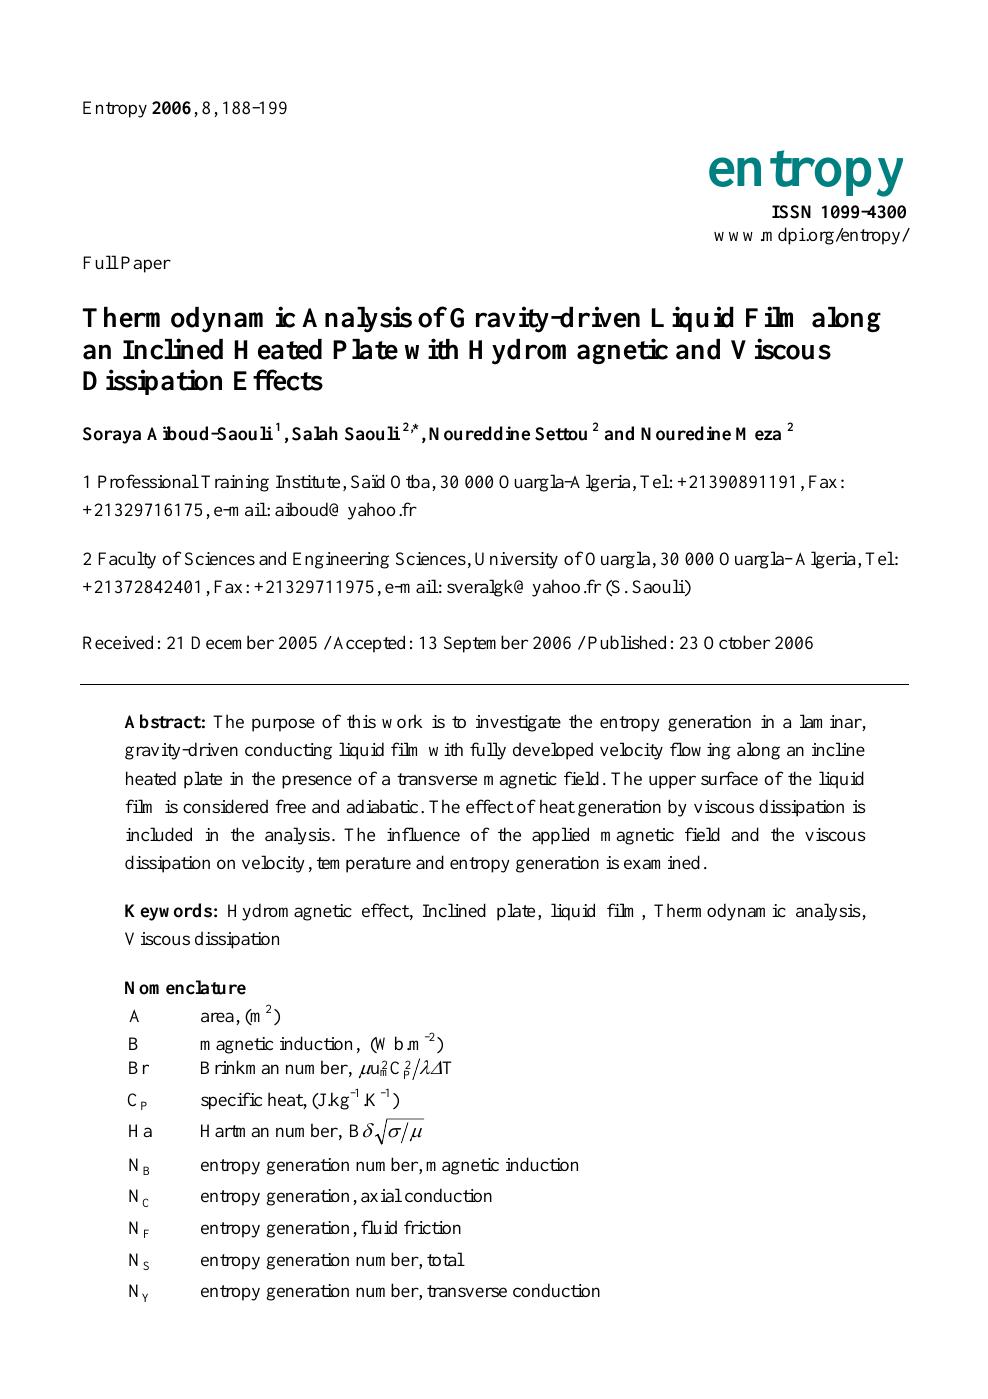 Thermodynamic Analysis of Gravity-driven Liquid Film along